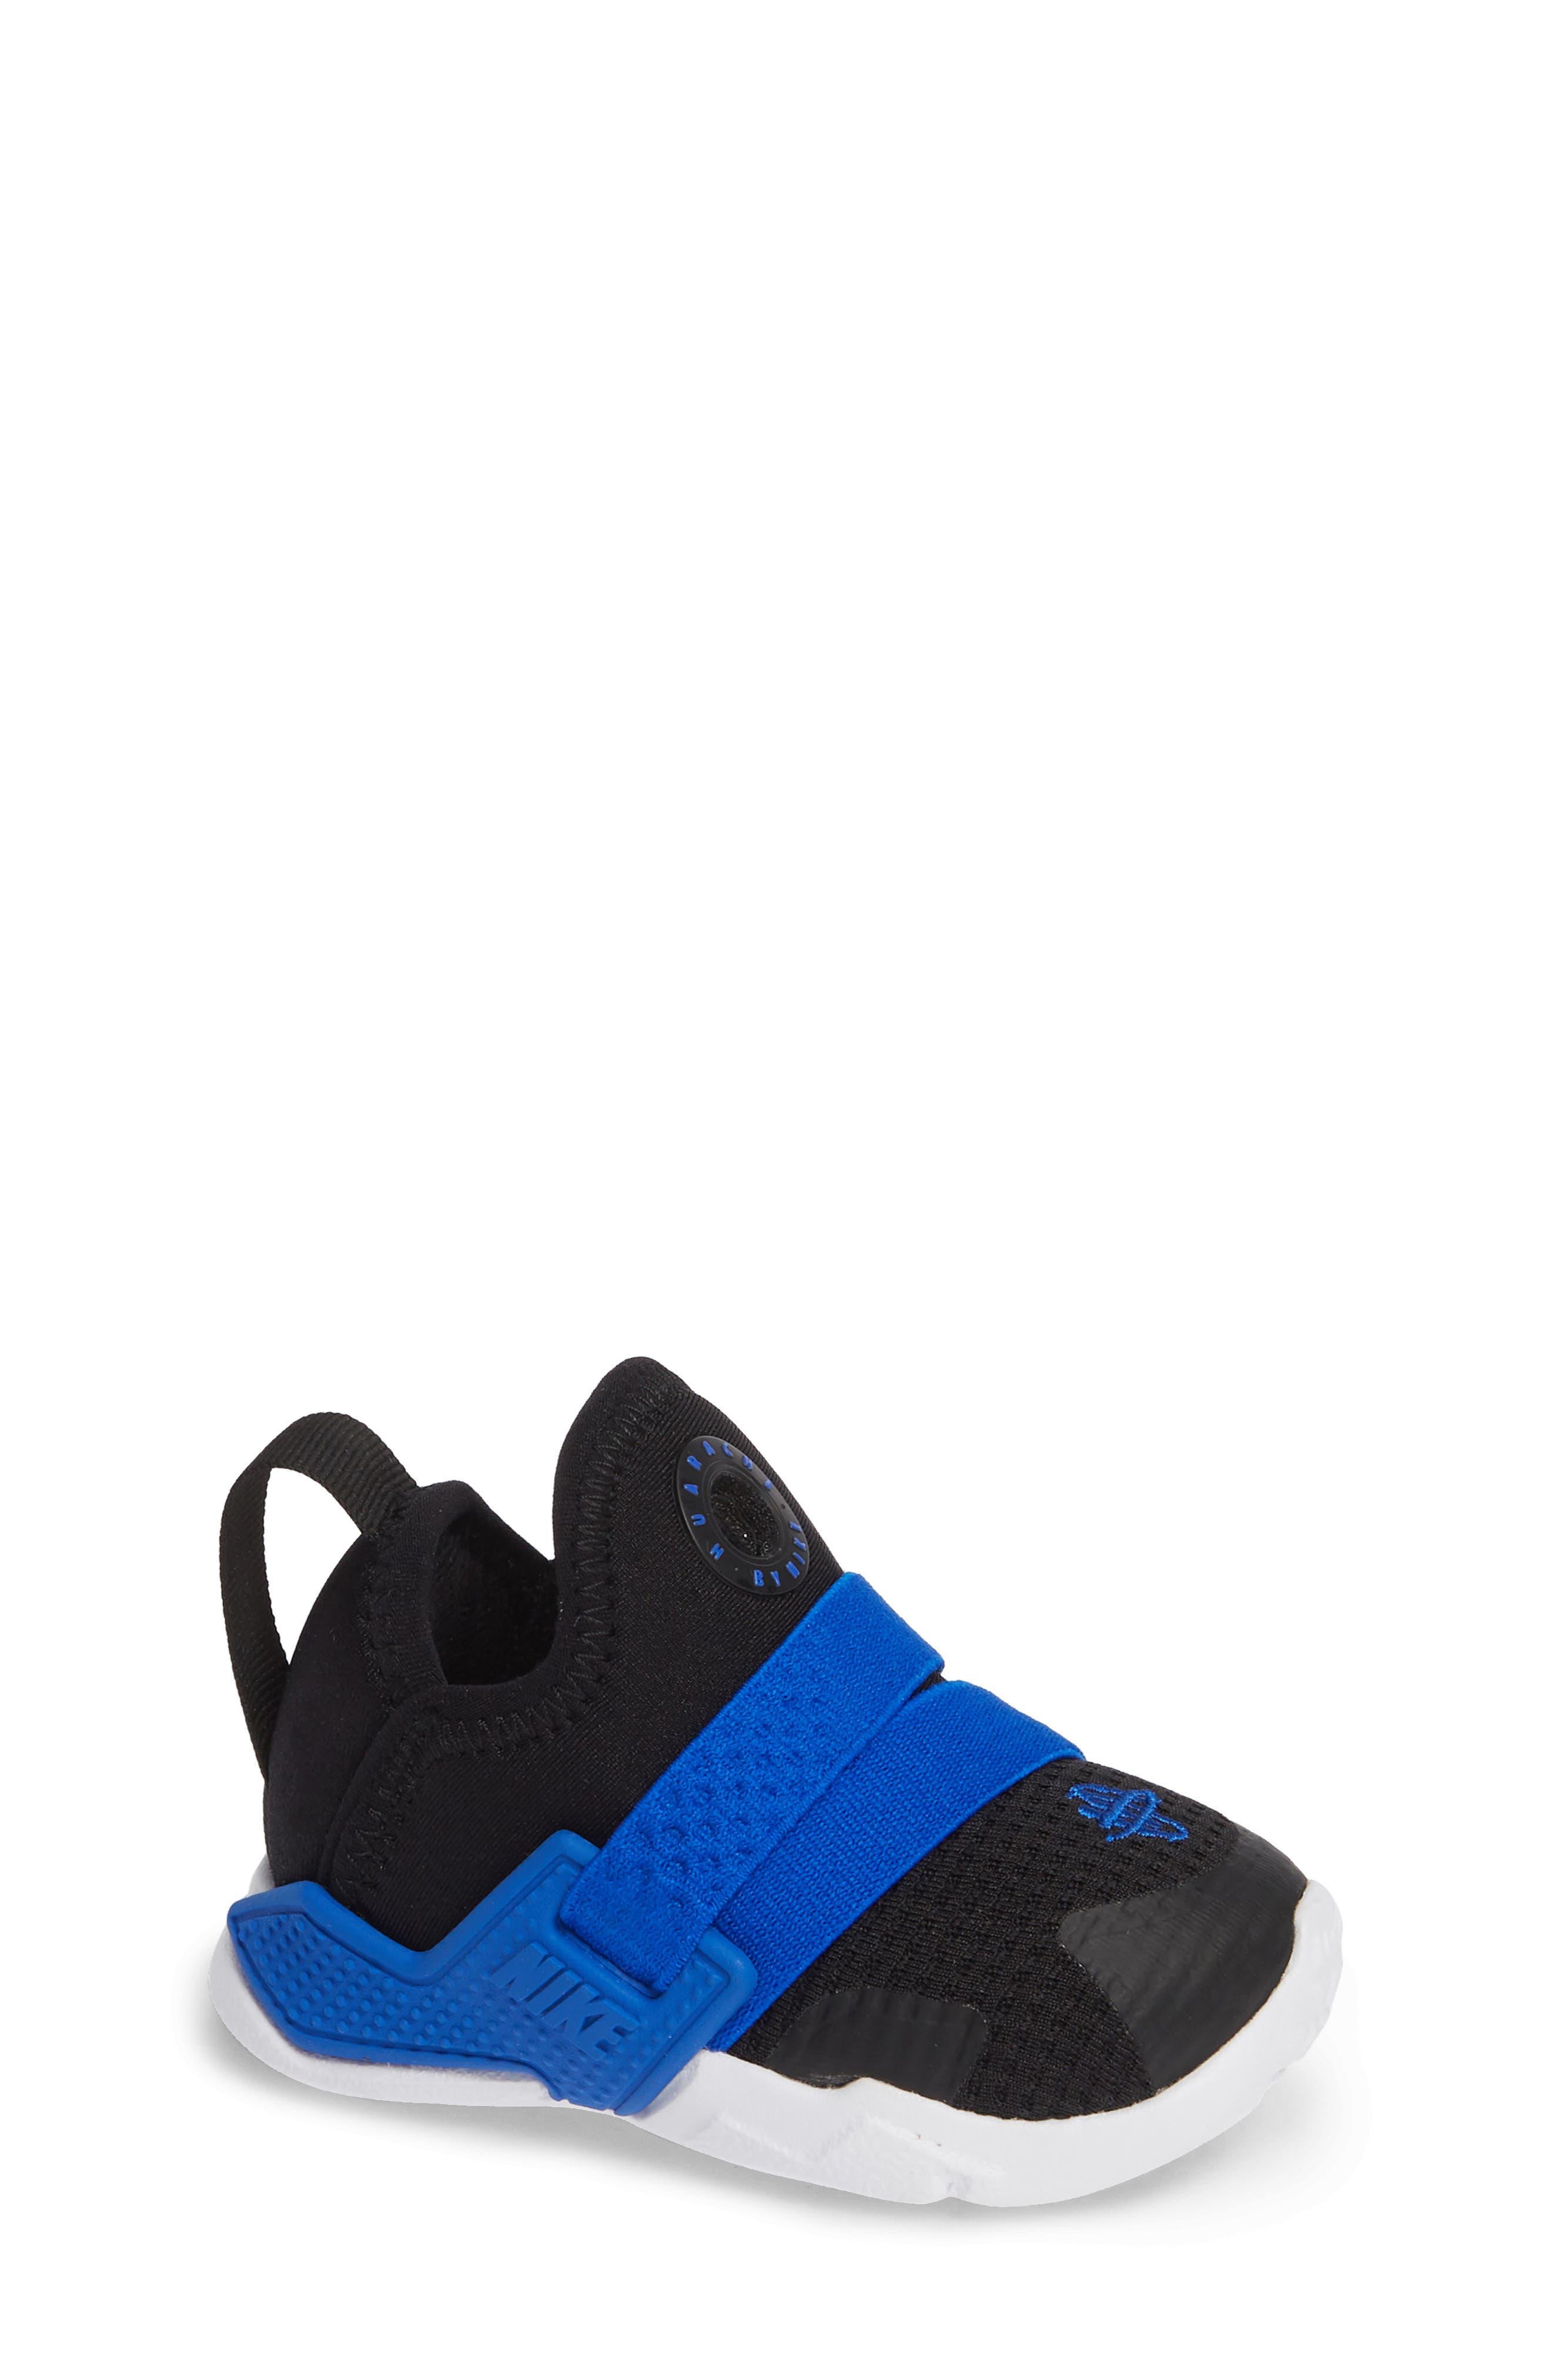 Huarache Extreme Sneaker,                         Main,                         color, BLACK/ BLUE-WHITE